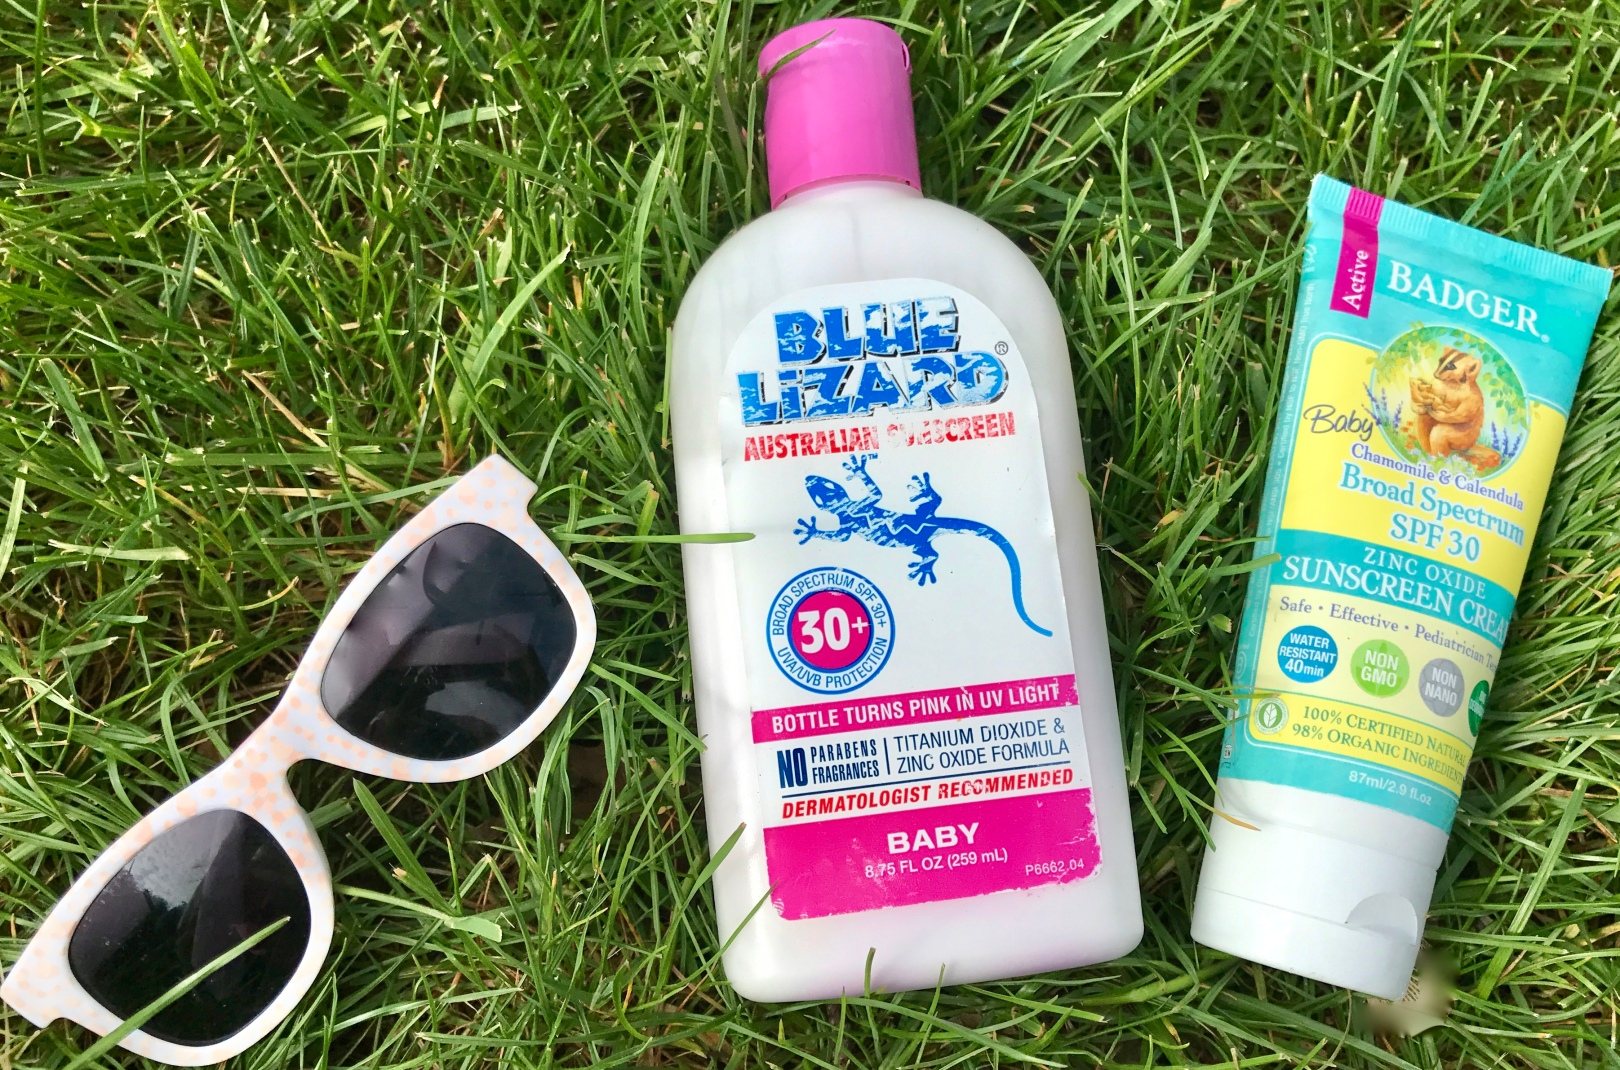 sunscreen and sunglasses